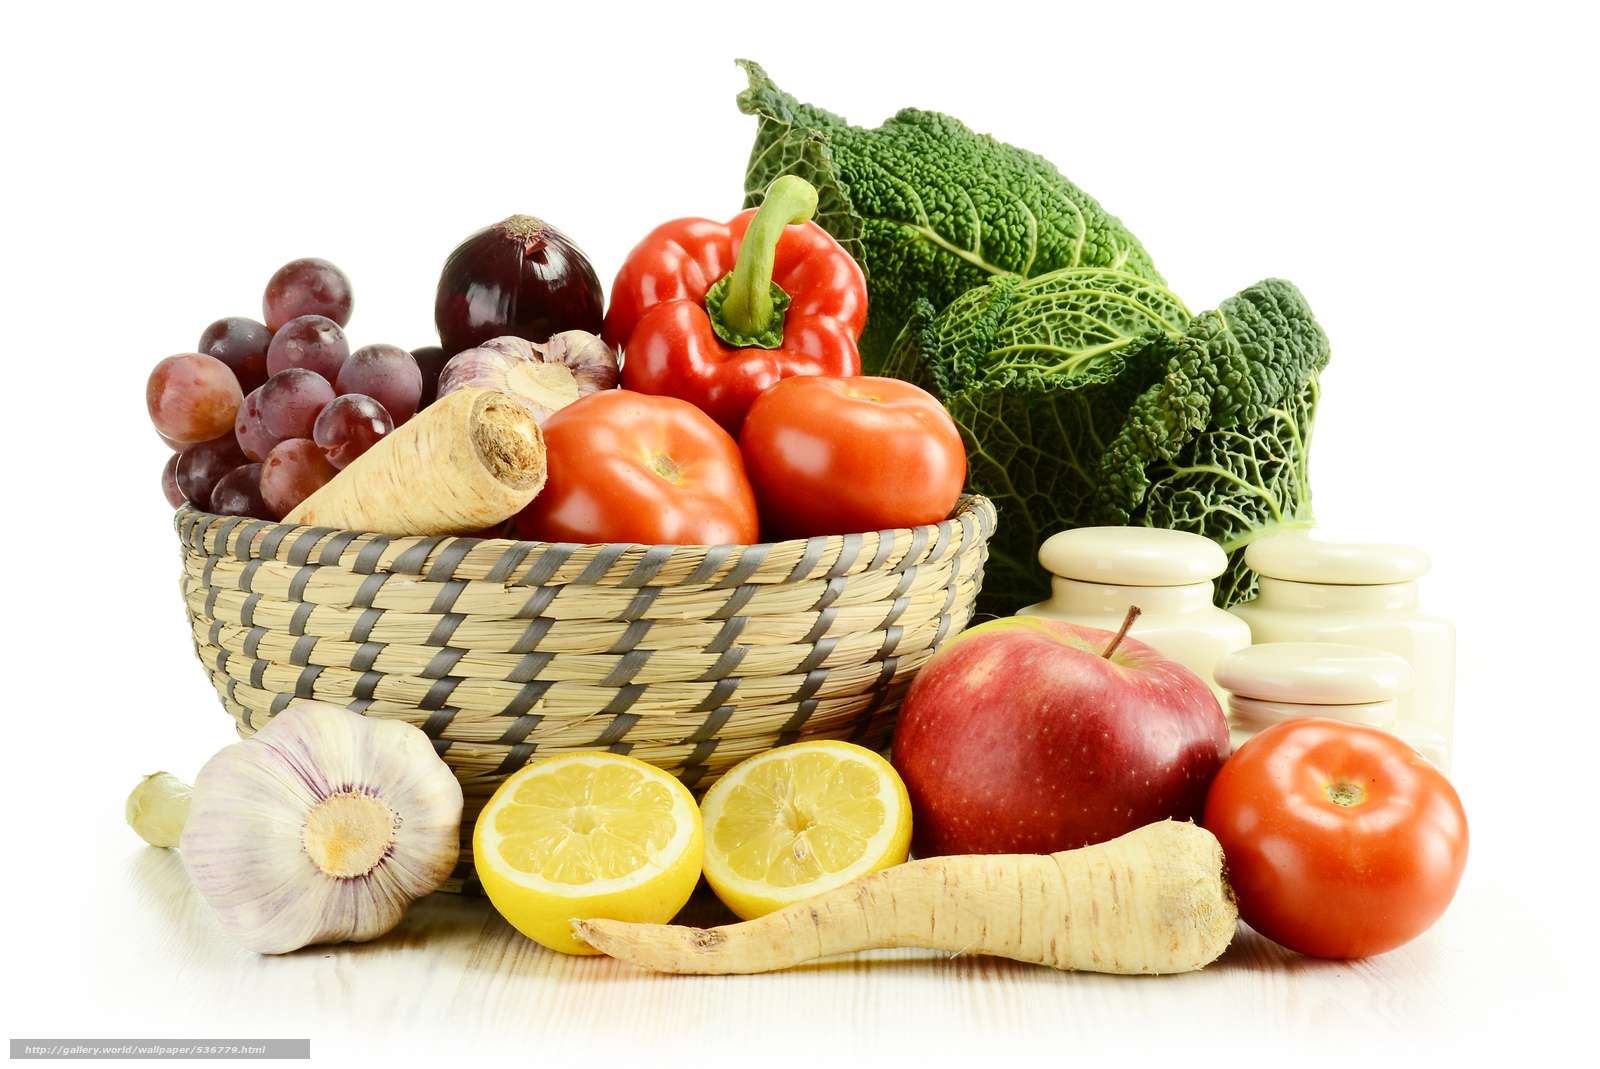 Ххх овощи в 6 фотография